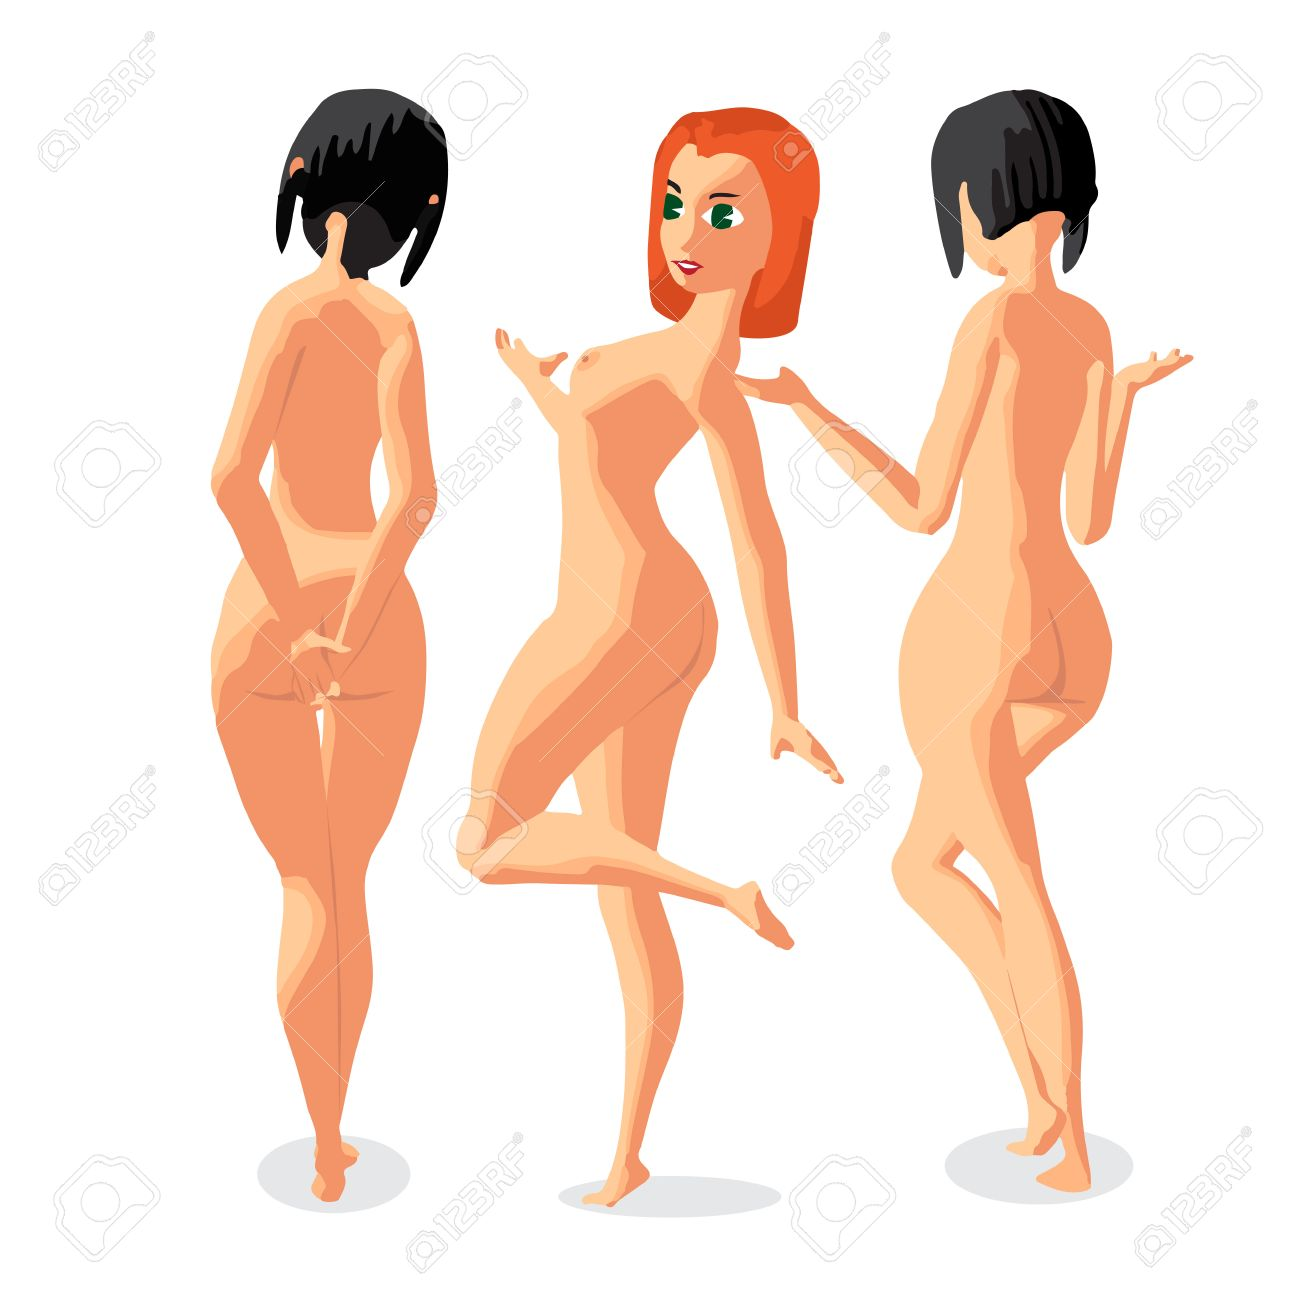 Pourto rico porn